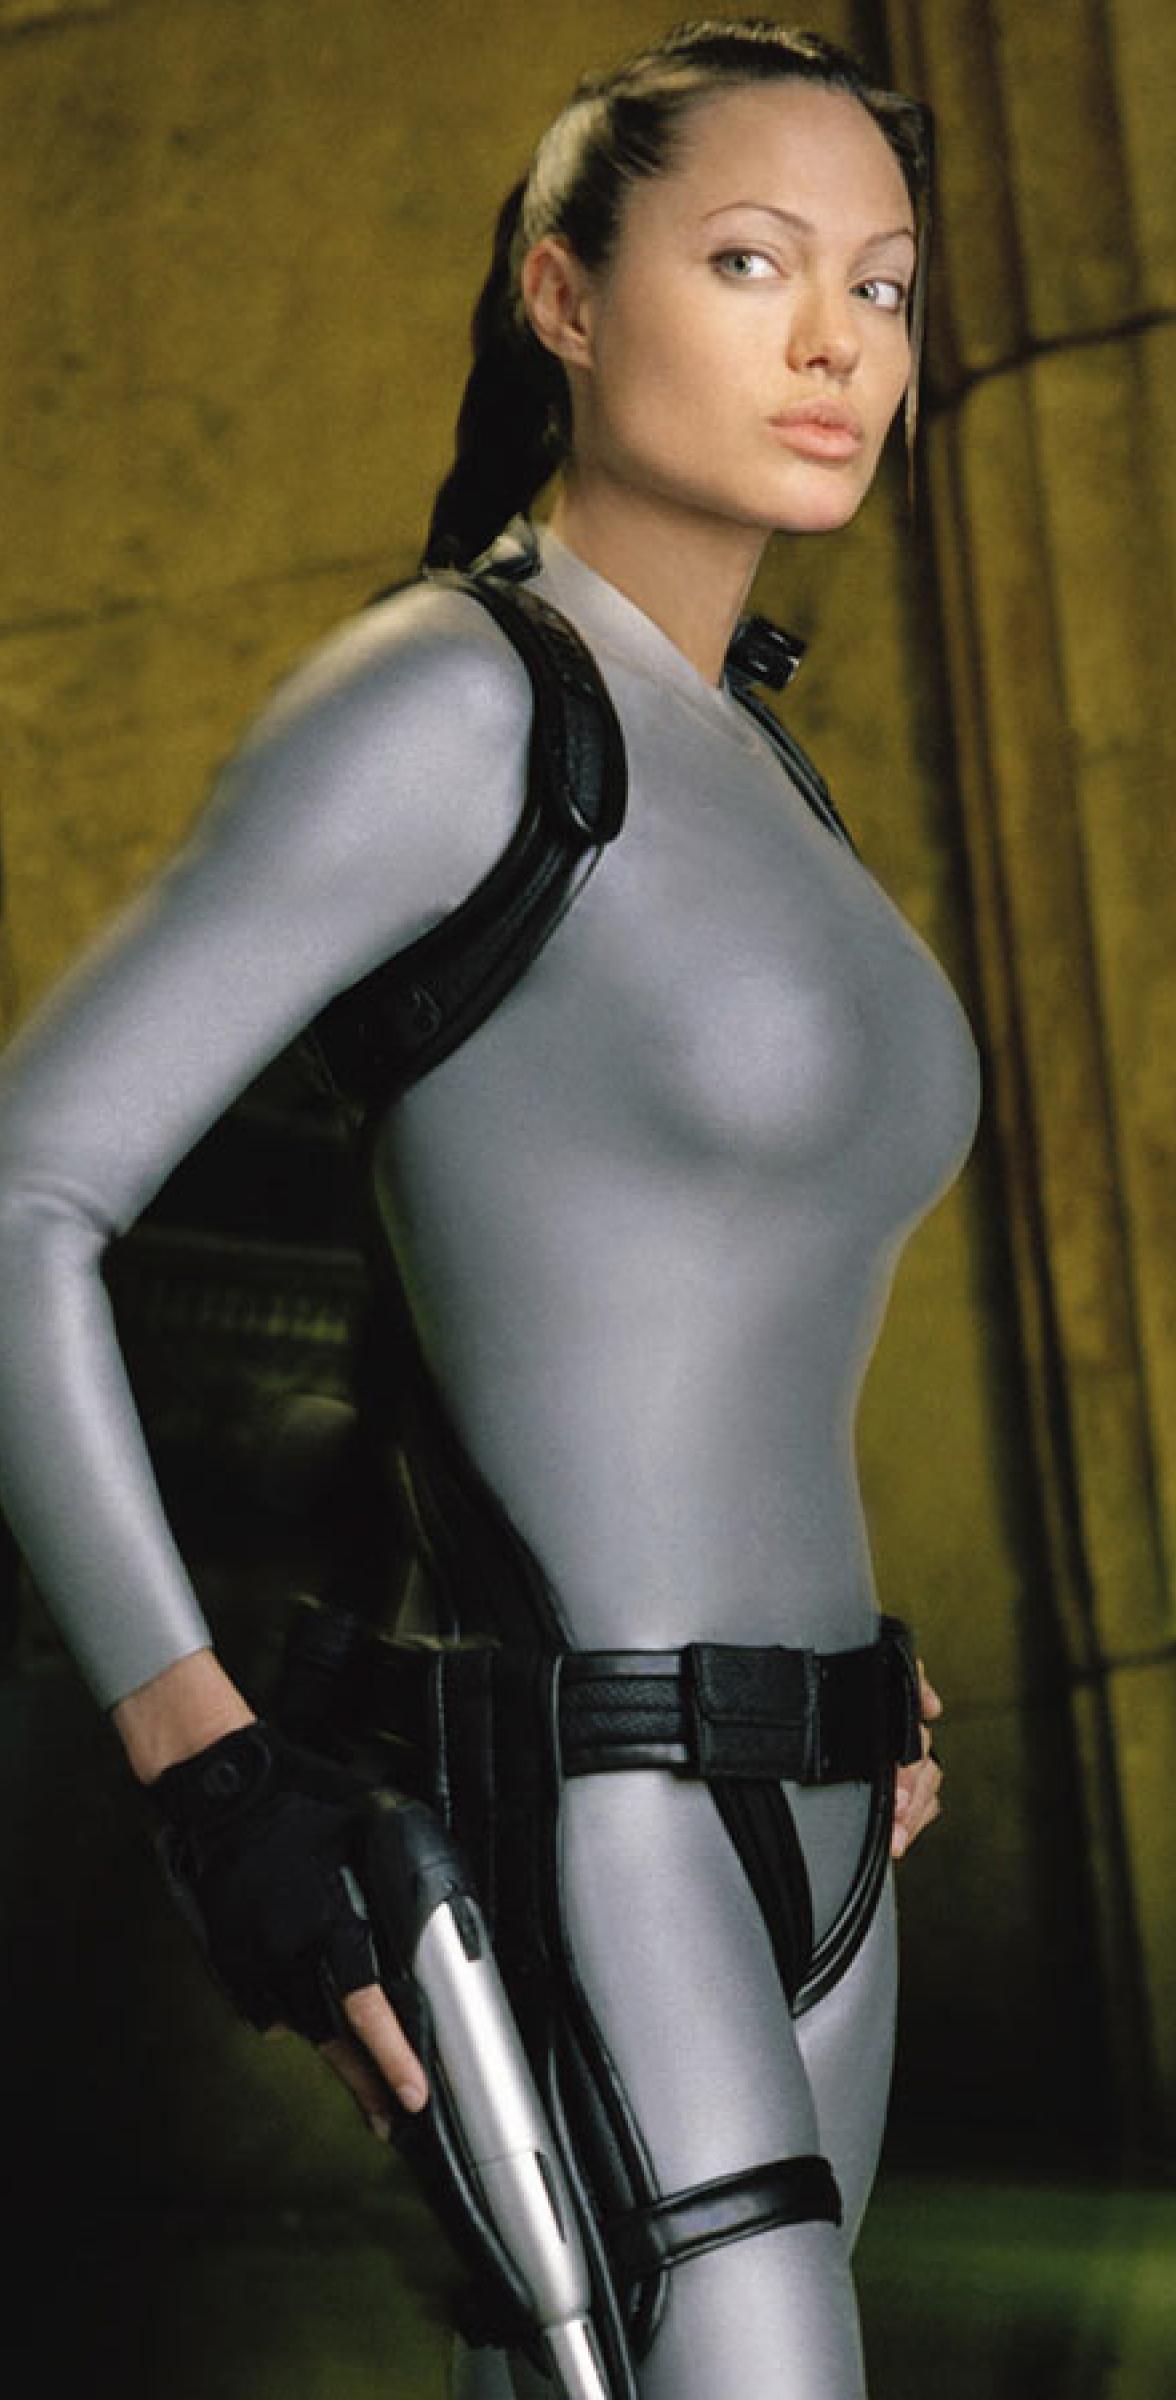 Angelina Jolie Sexi Movie 1176x2400 angelina jolie sexy hd photos 1176x2400 resolution